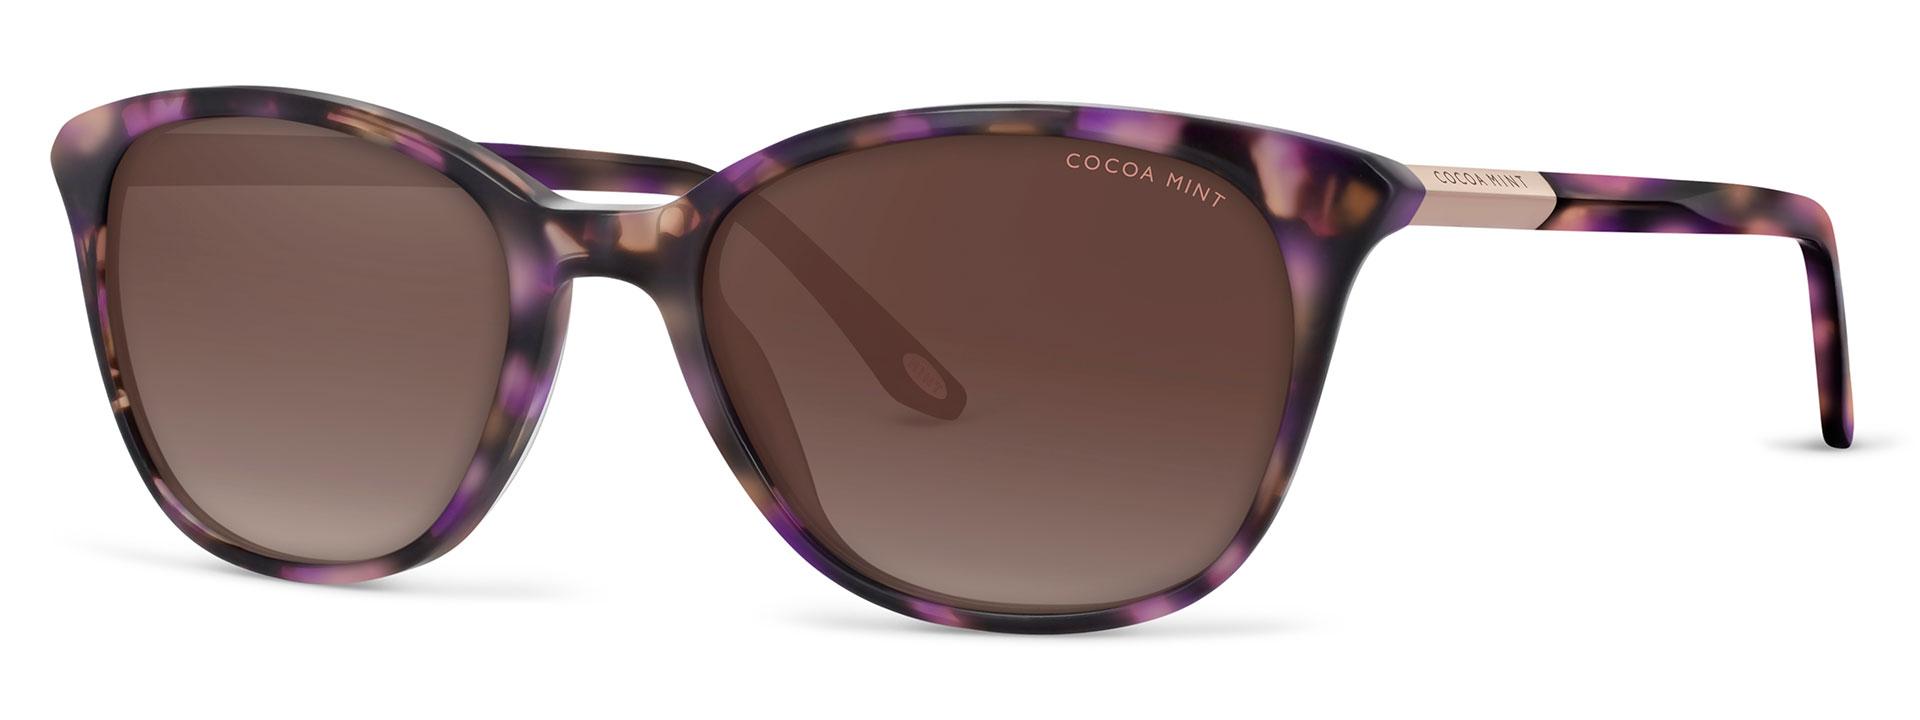 Cocoa Mint Sun Glasses - Purple Tortoiseshell - CMS2060-C1